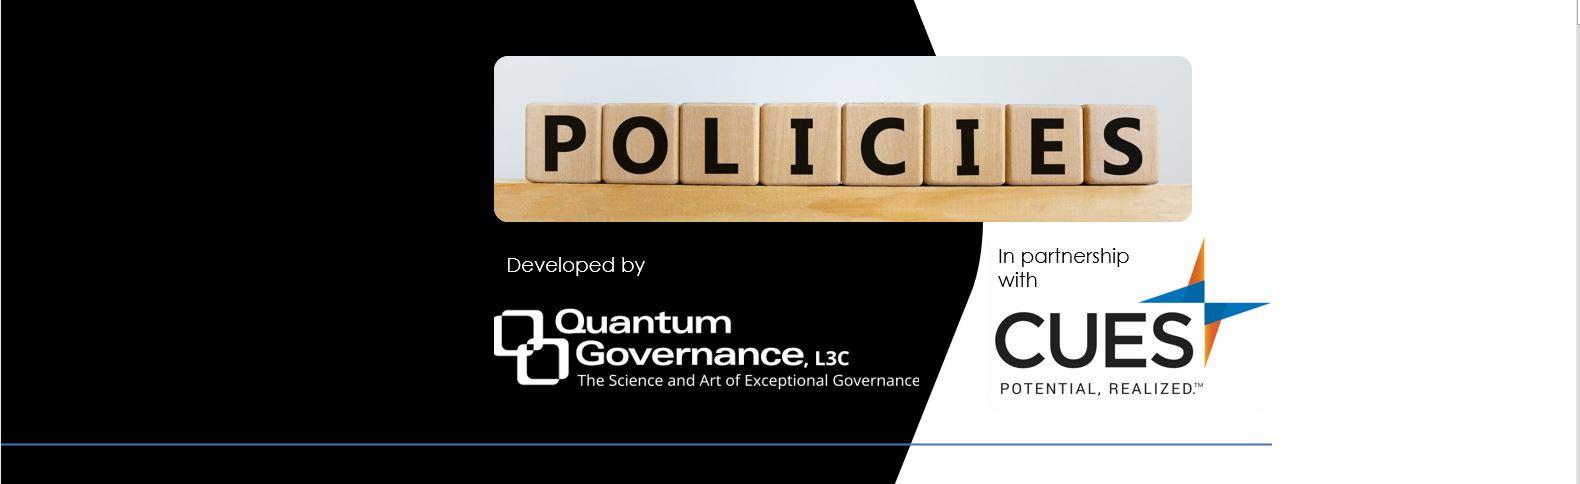 Policies full size capture header